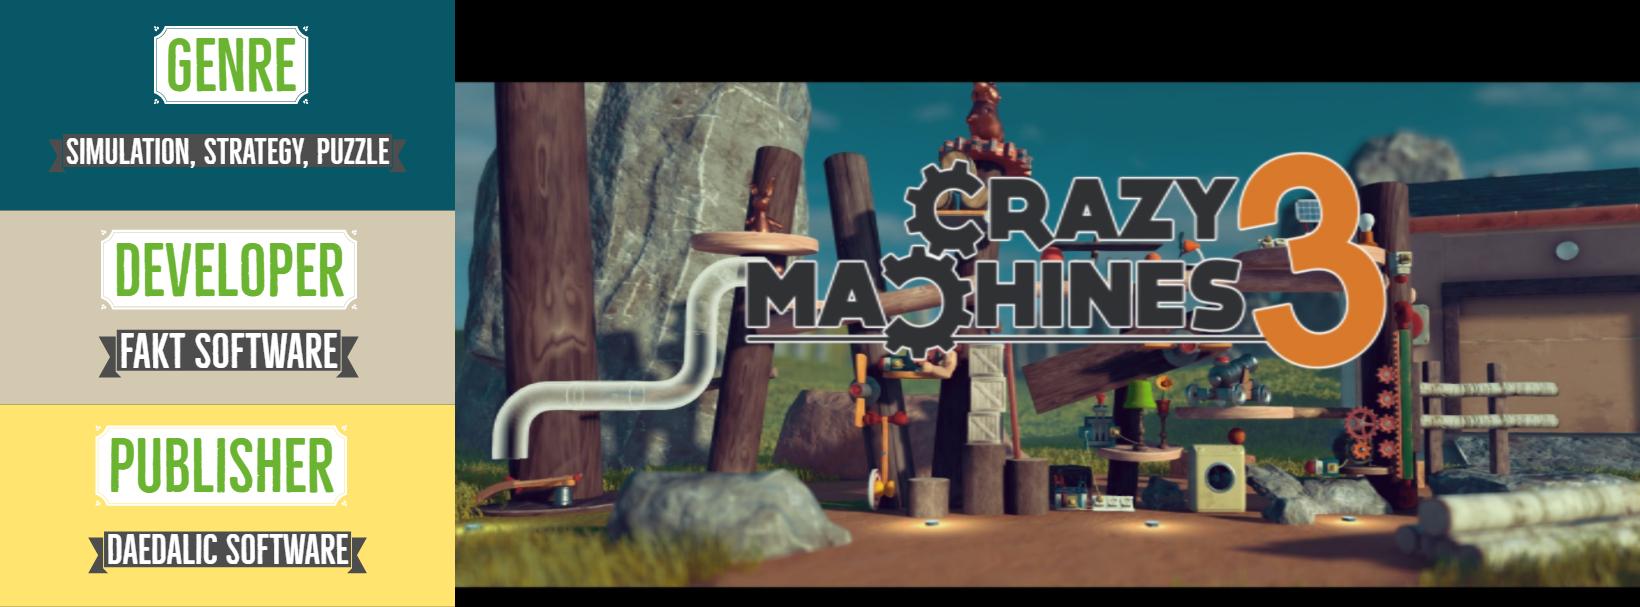 crazy-machines-3-banner-image